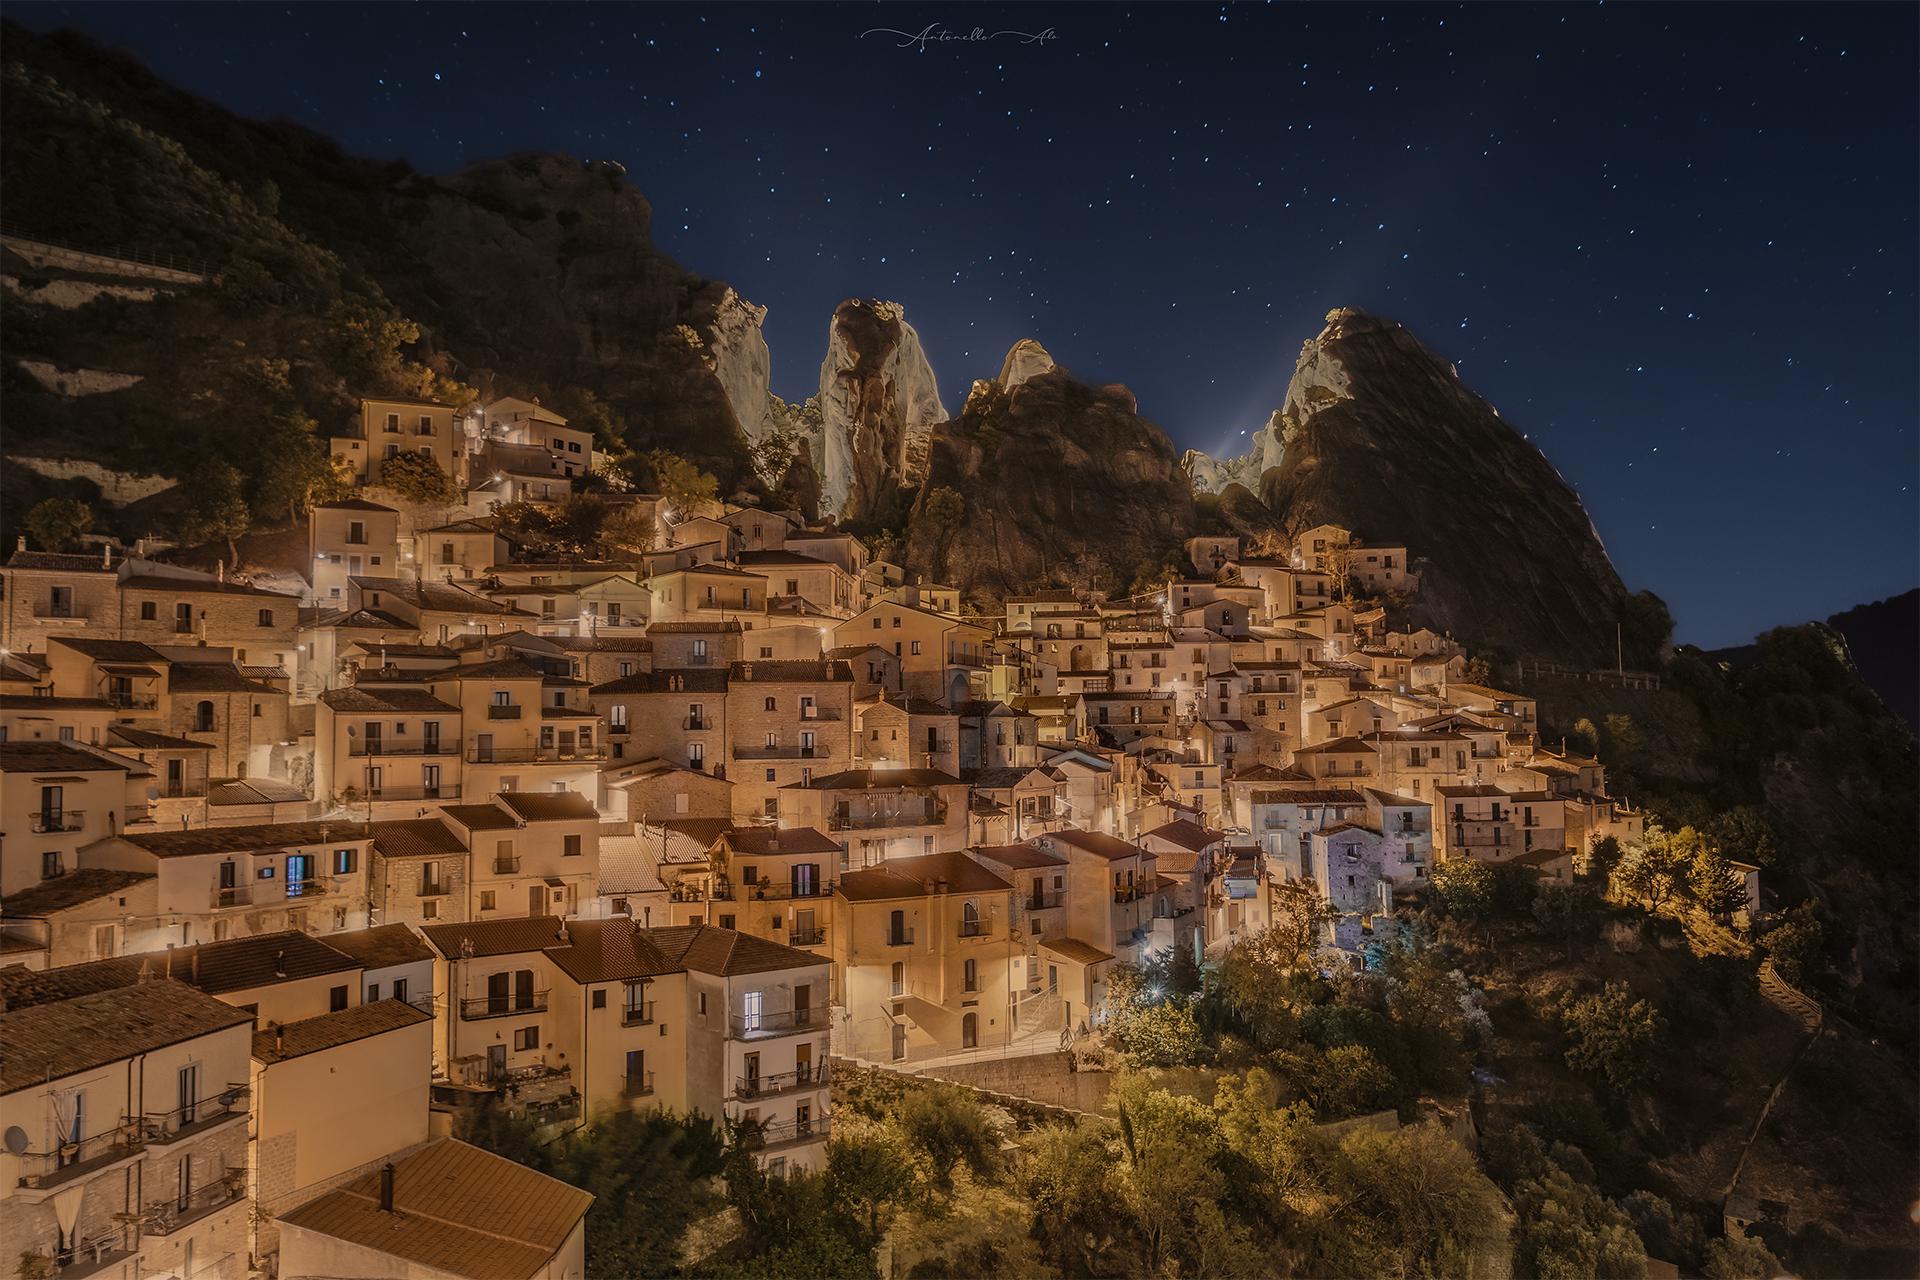 Castelmezzano in nottruna ...